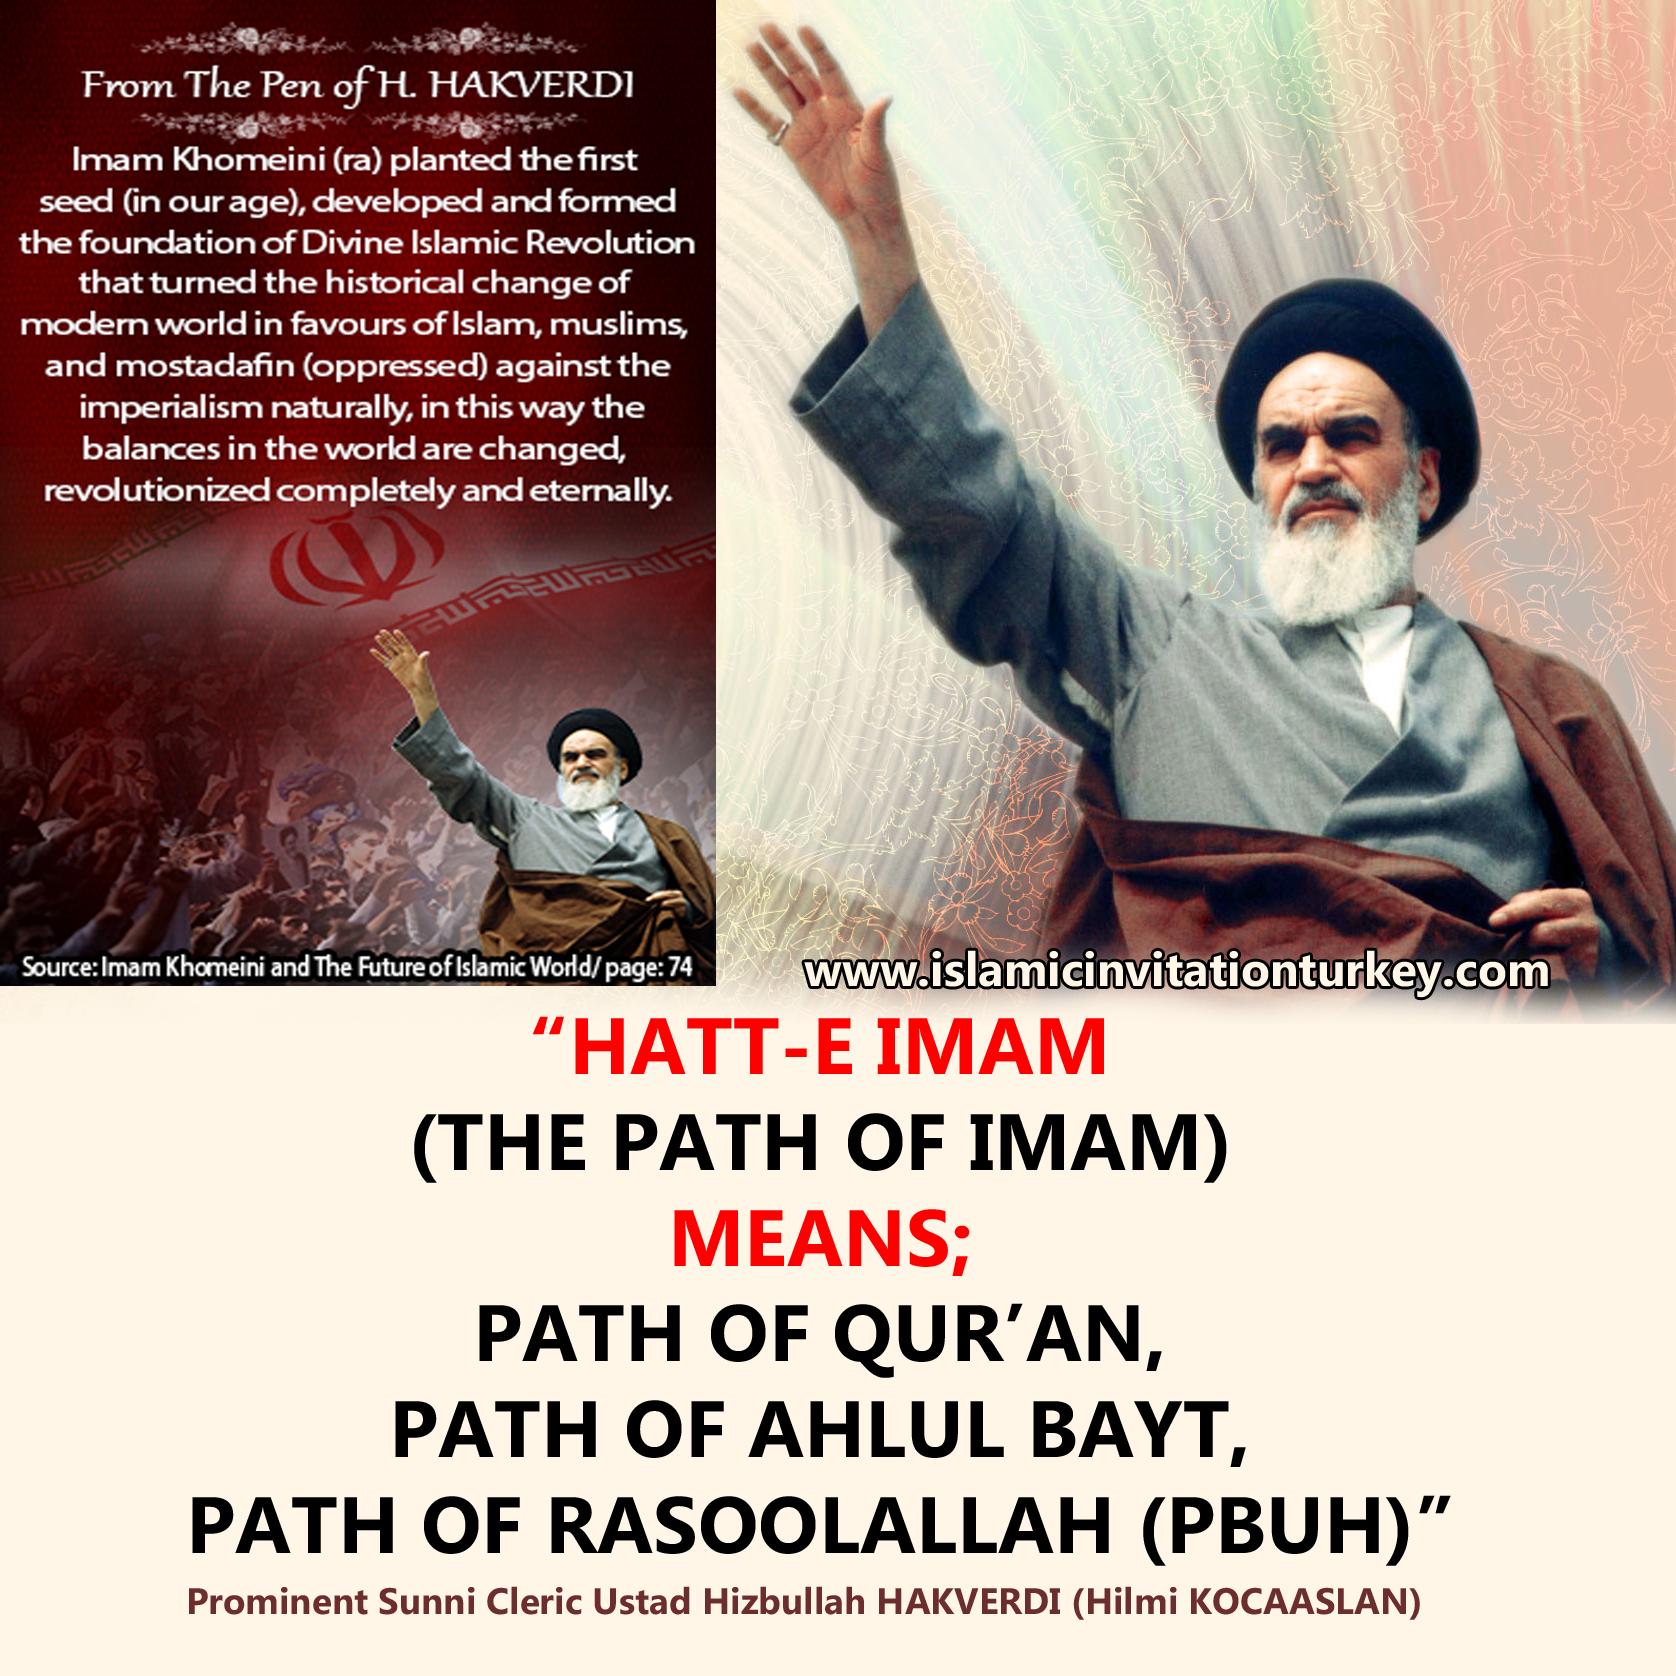 path-of-imam